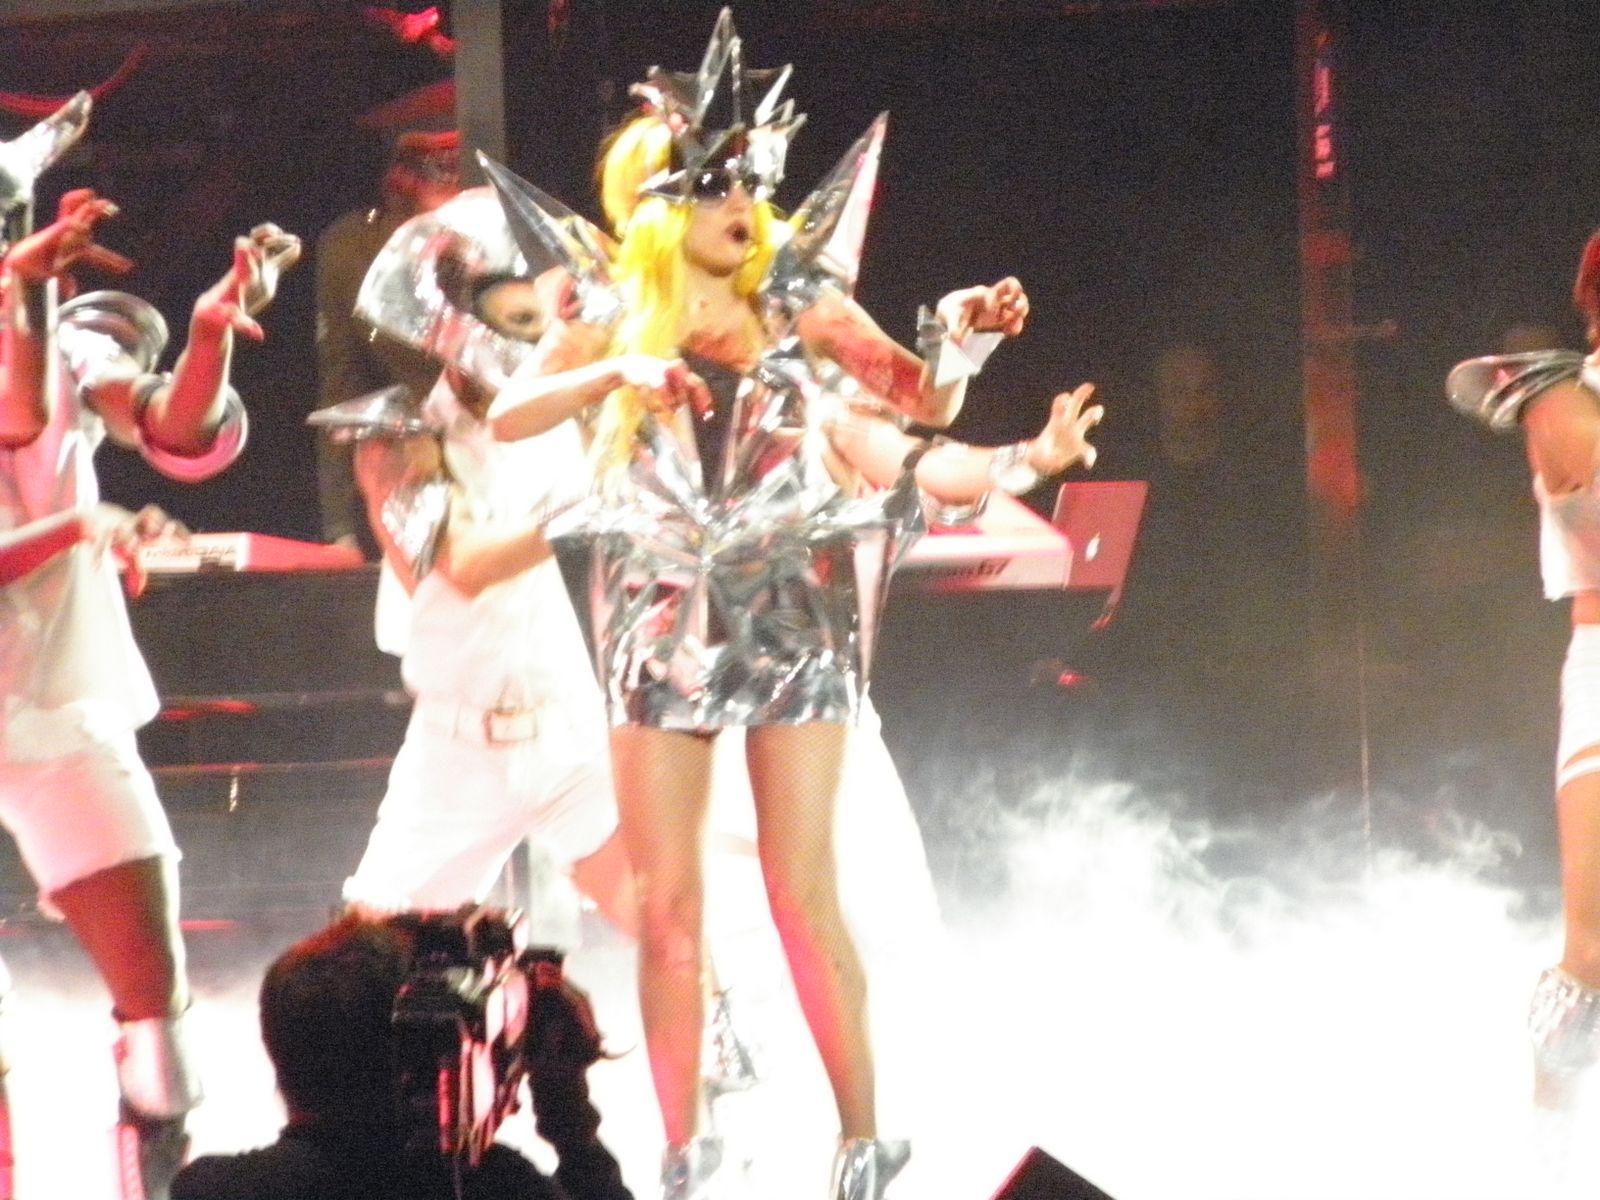 Maria Aragon & Lady Gaga Ate My Heart in Toronto